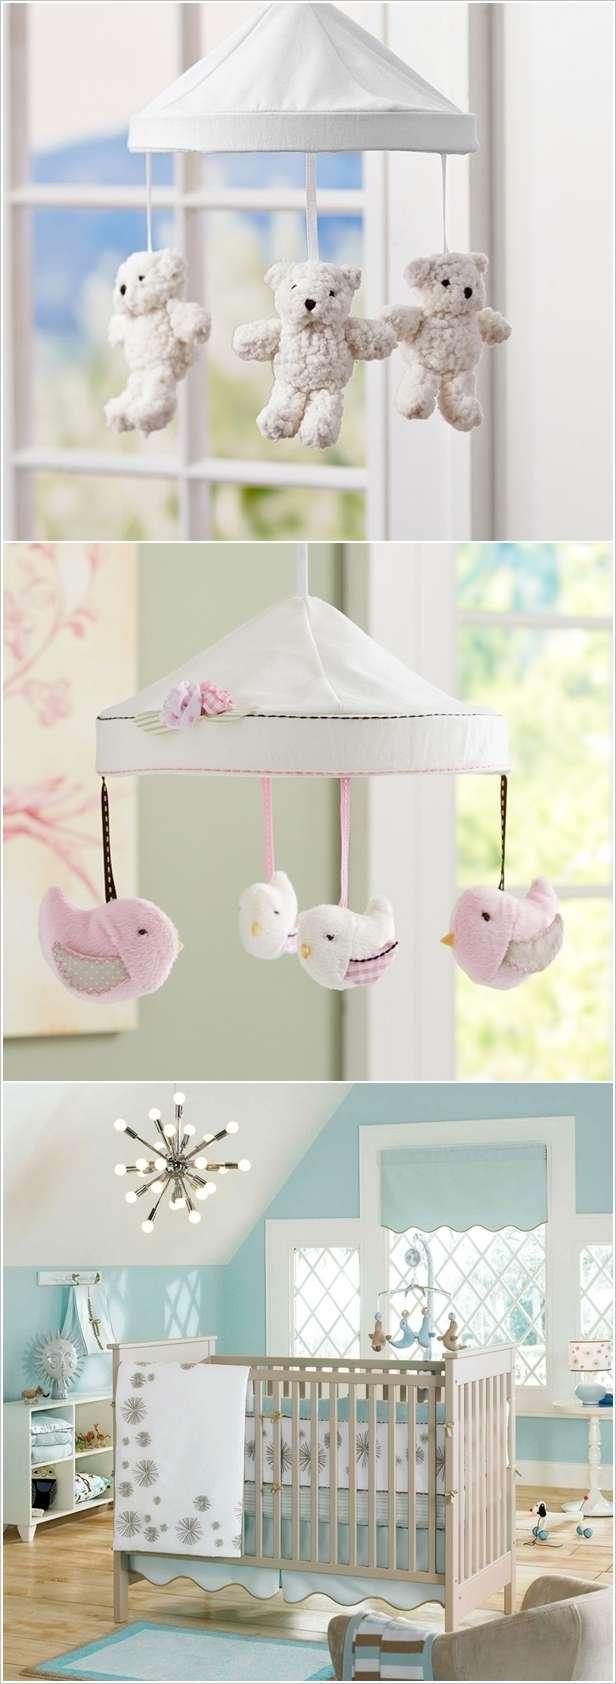 5 Super Cute Ideas For Your Baby Nursery